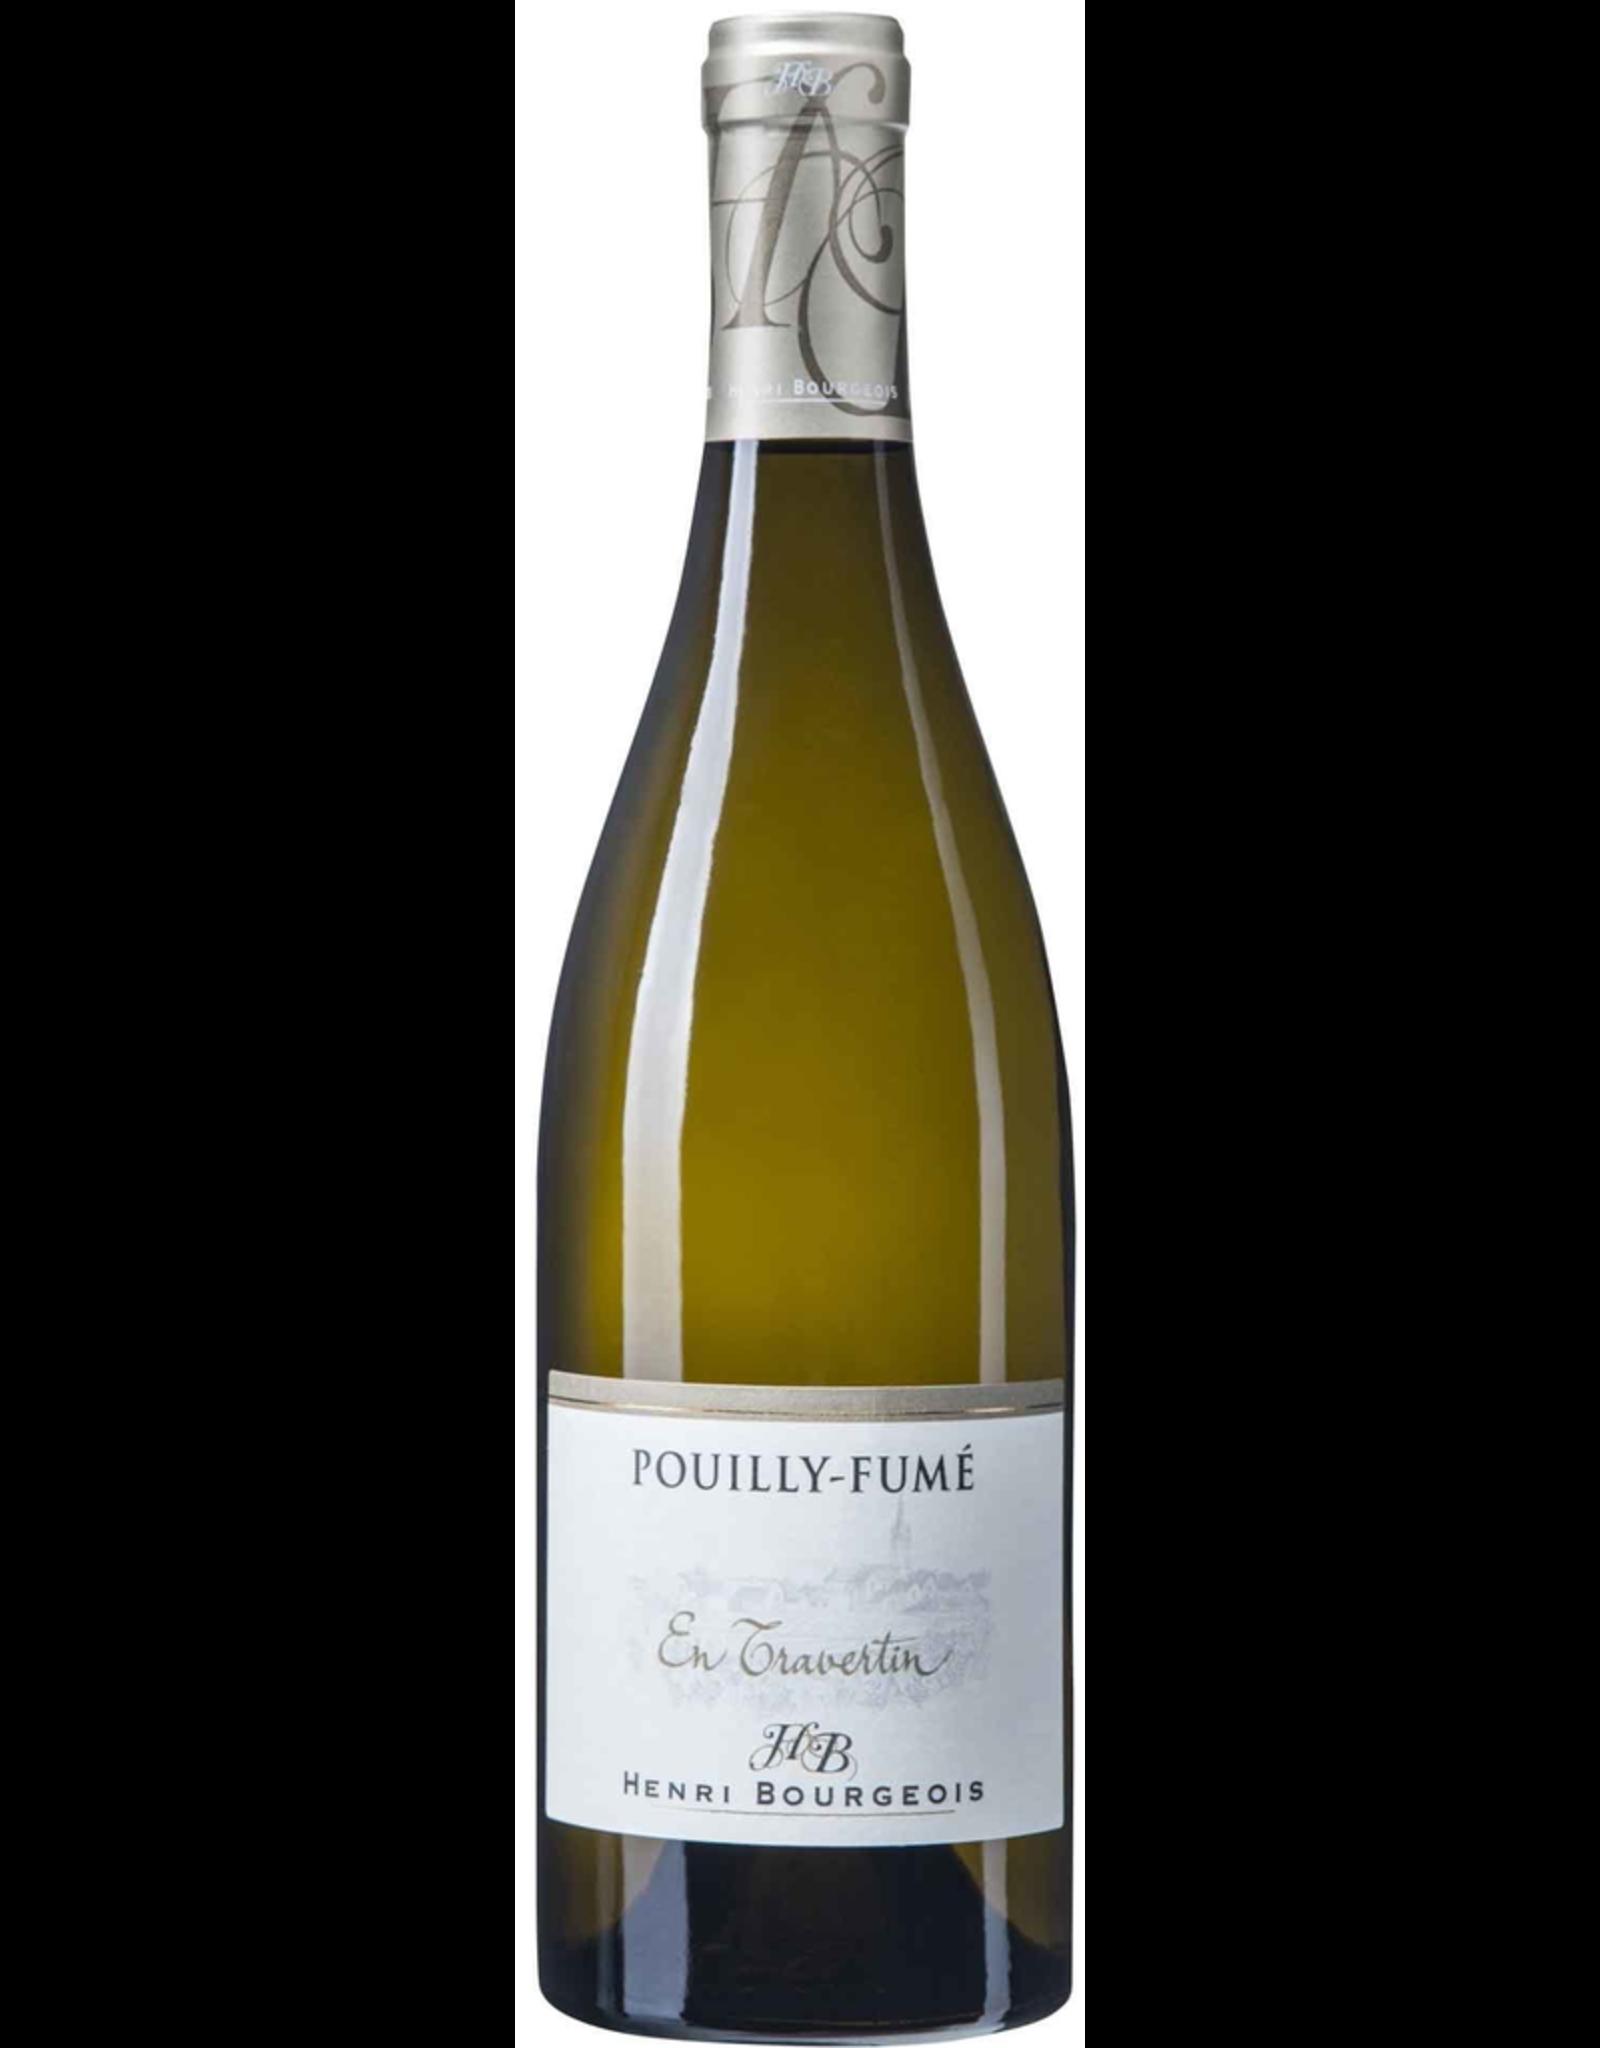 White Wine 2018, Henri Bourgeois En Travertin Pouilly-Fume, Sauvignon Blanc, Pouilly-Fume, Loire Valley, France, 13% Alc, CTnr, TW92